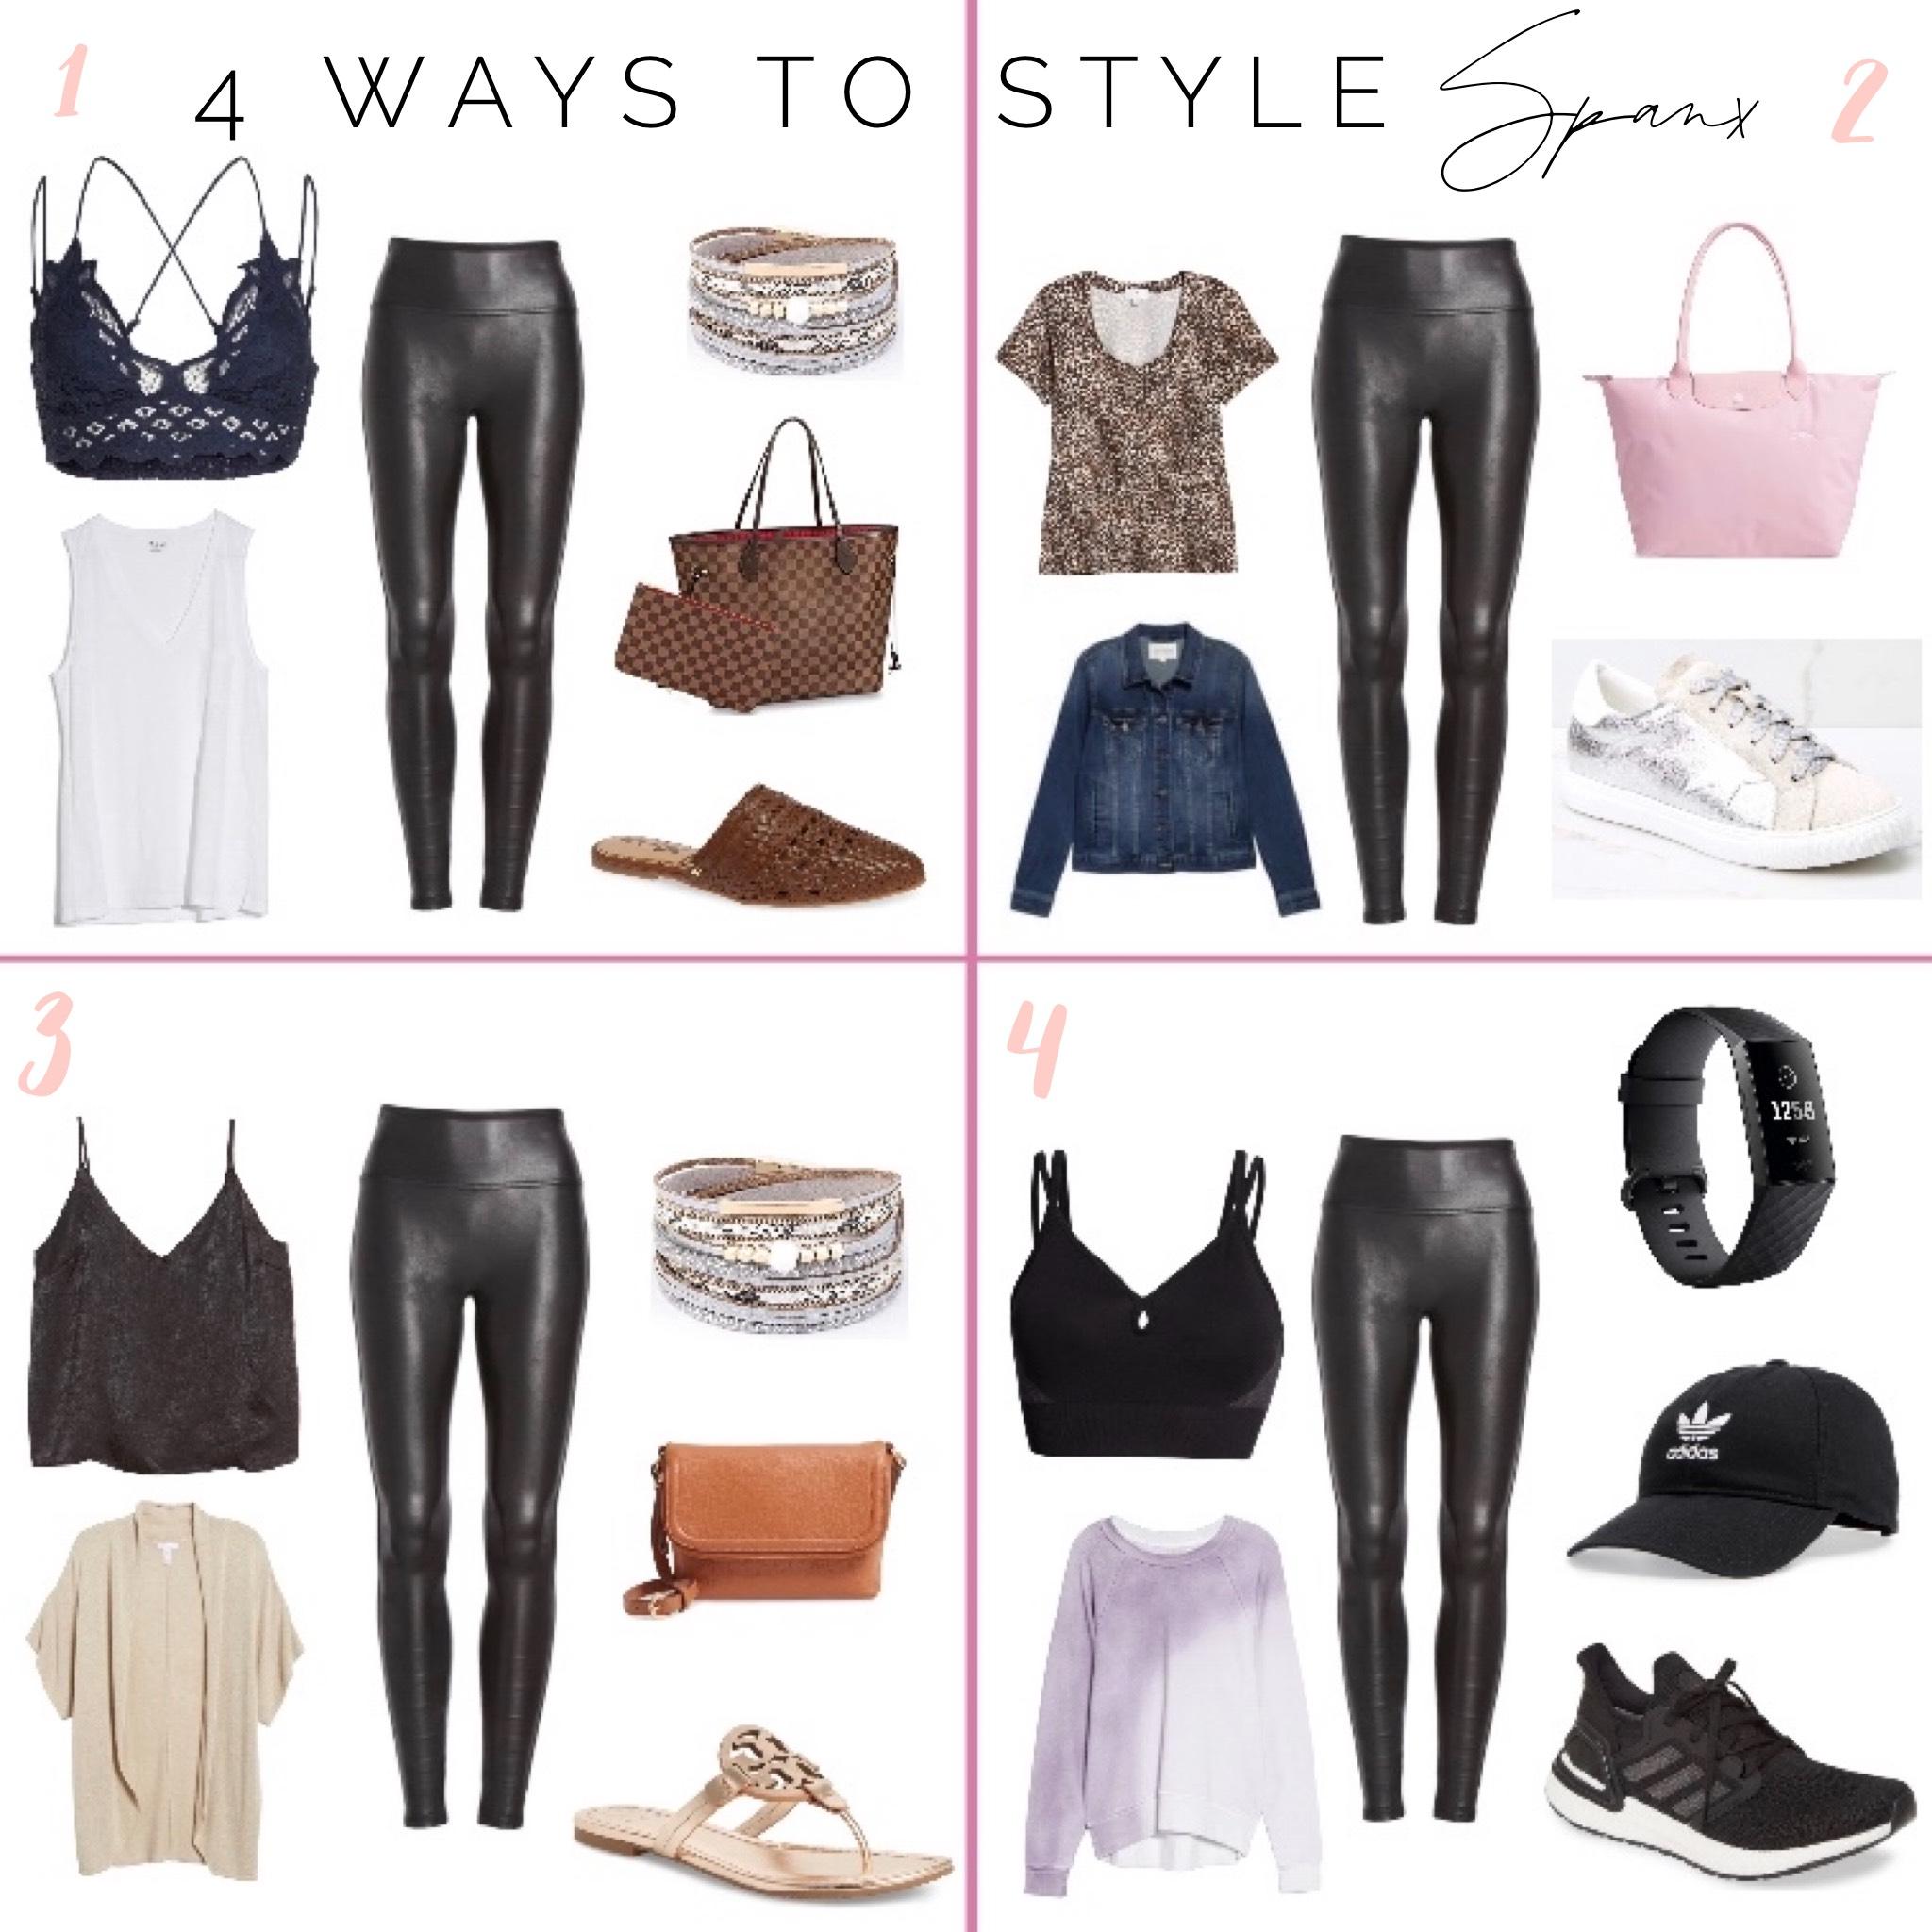 How to style SPANX leggings four ways